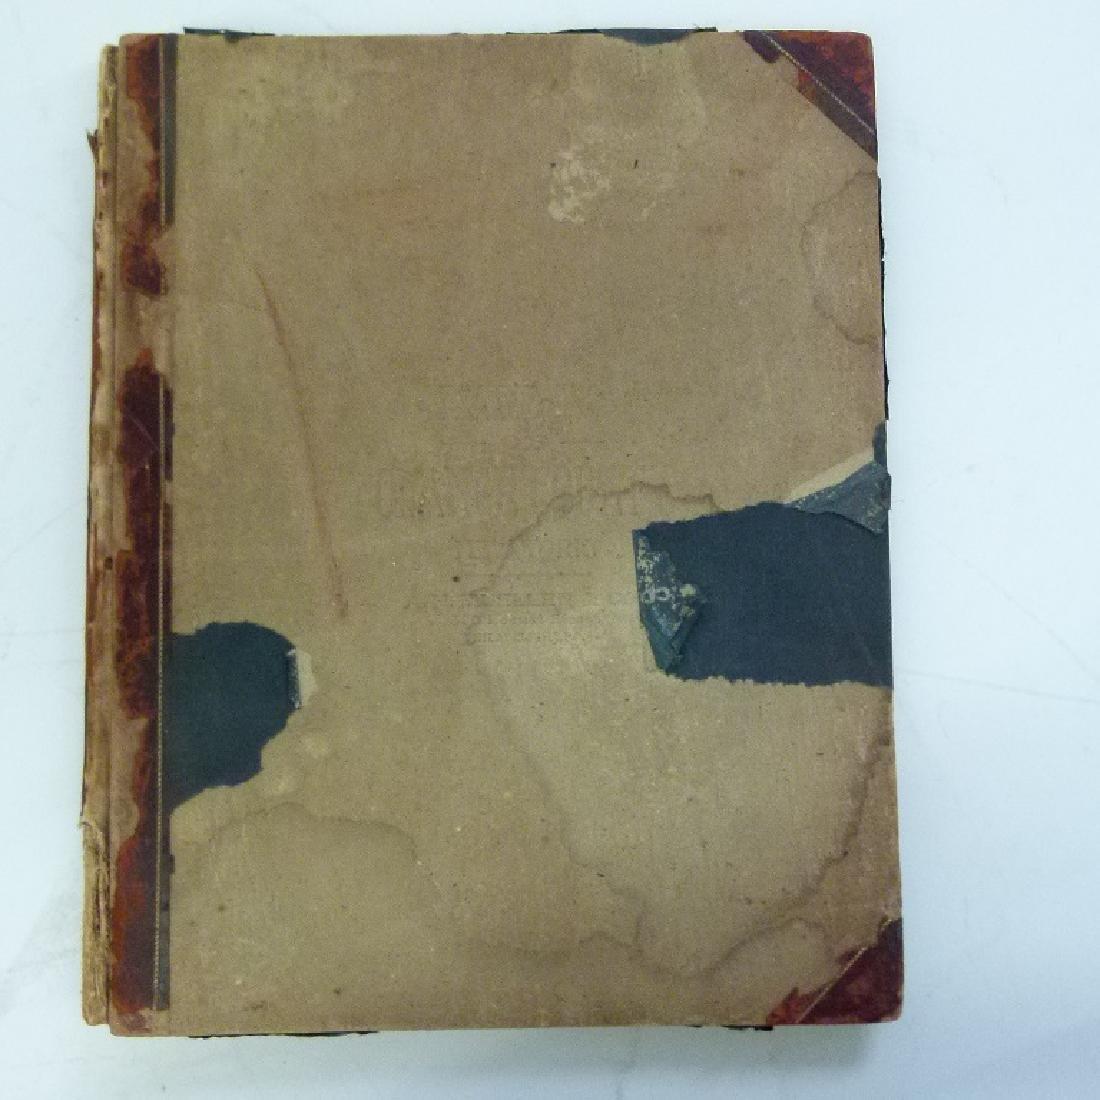 (2) ATLAS OF ORANGE COUNTY NY, A.H. MUELLER 1903 - 7